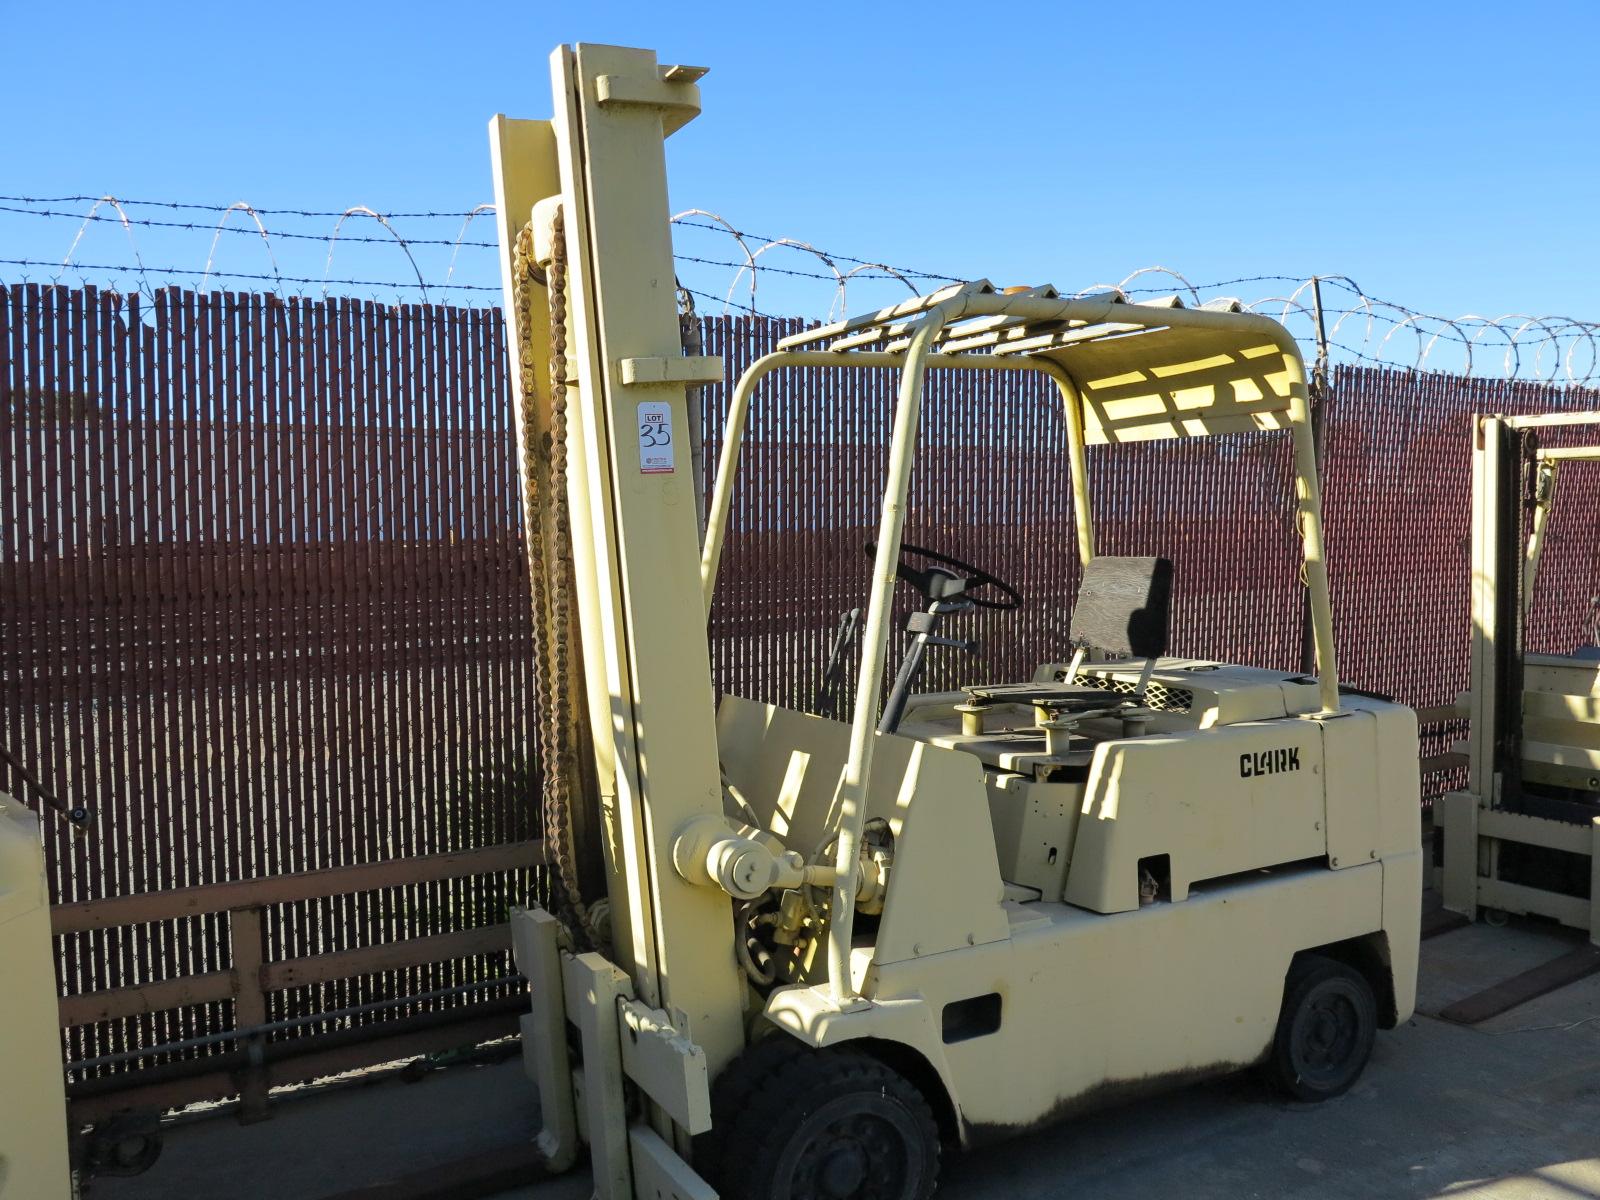 Lot 35 - CLARK 10,000 LB LP FORKLIFT, S/N C100-6-940-368, OUT OF SERVICE